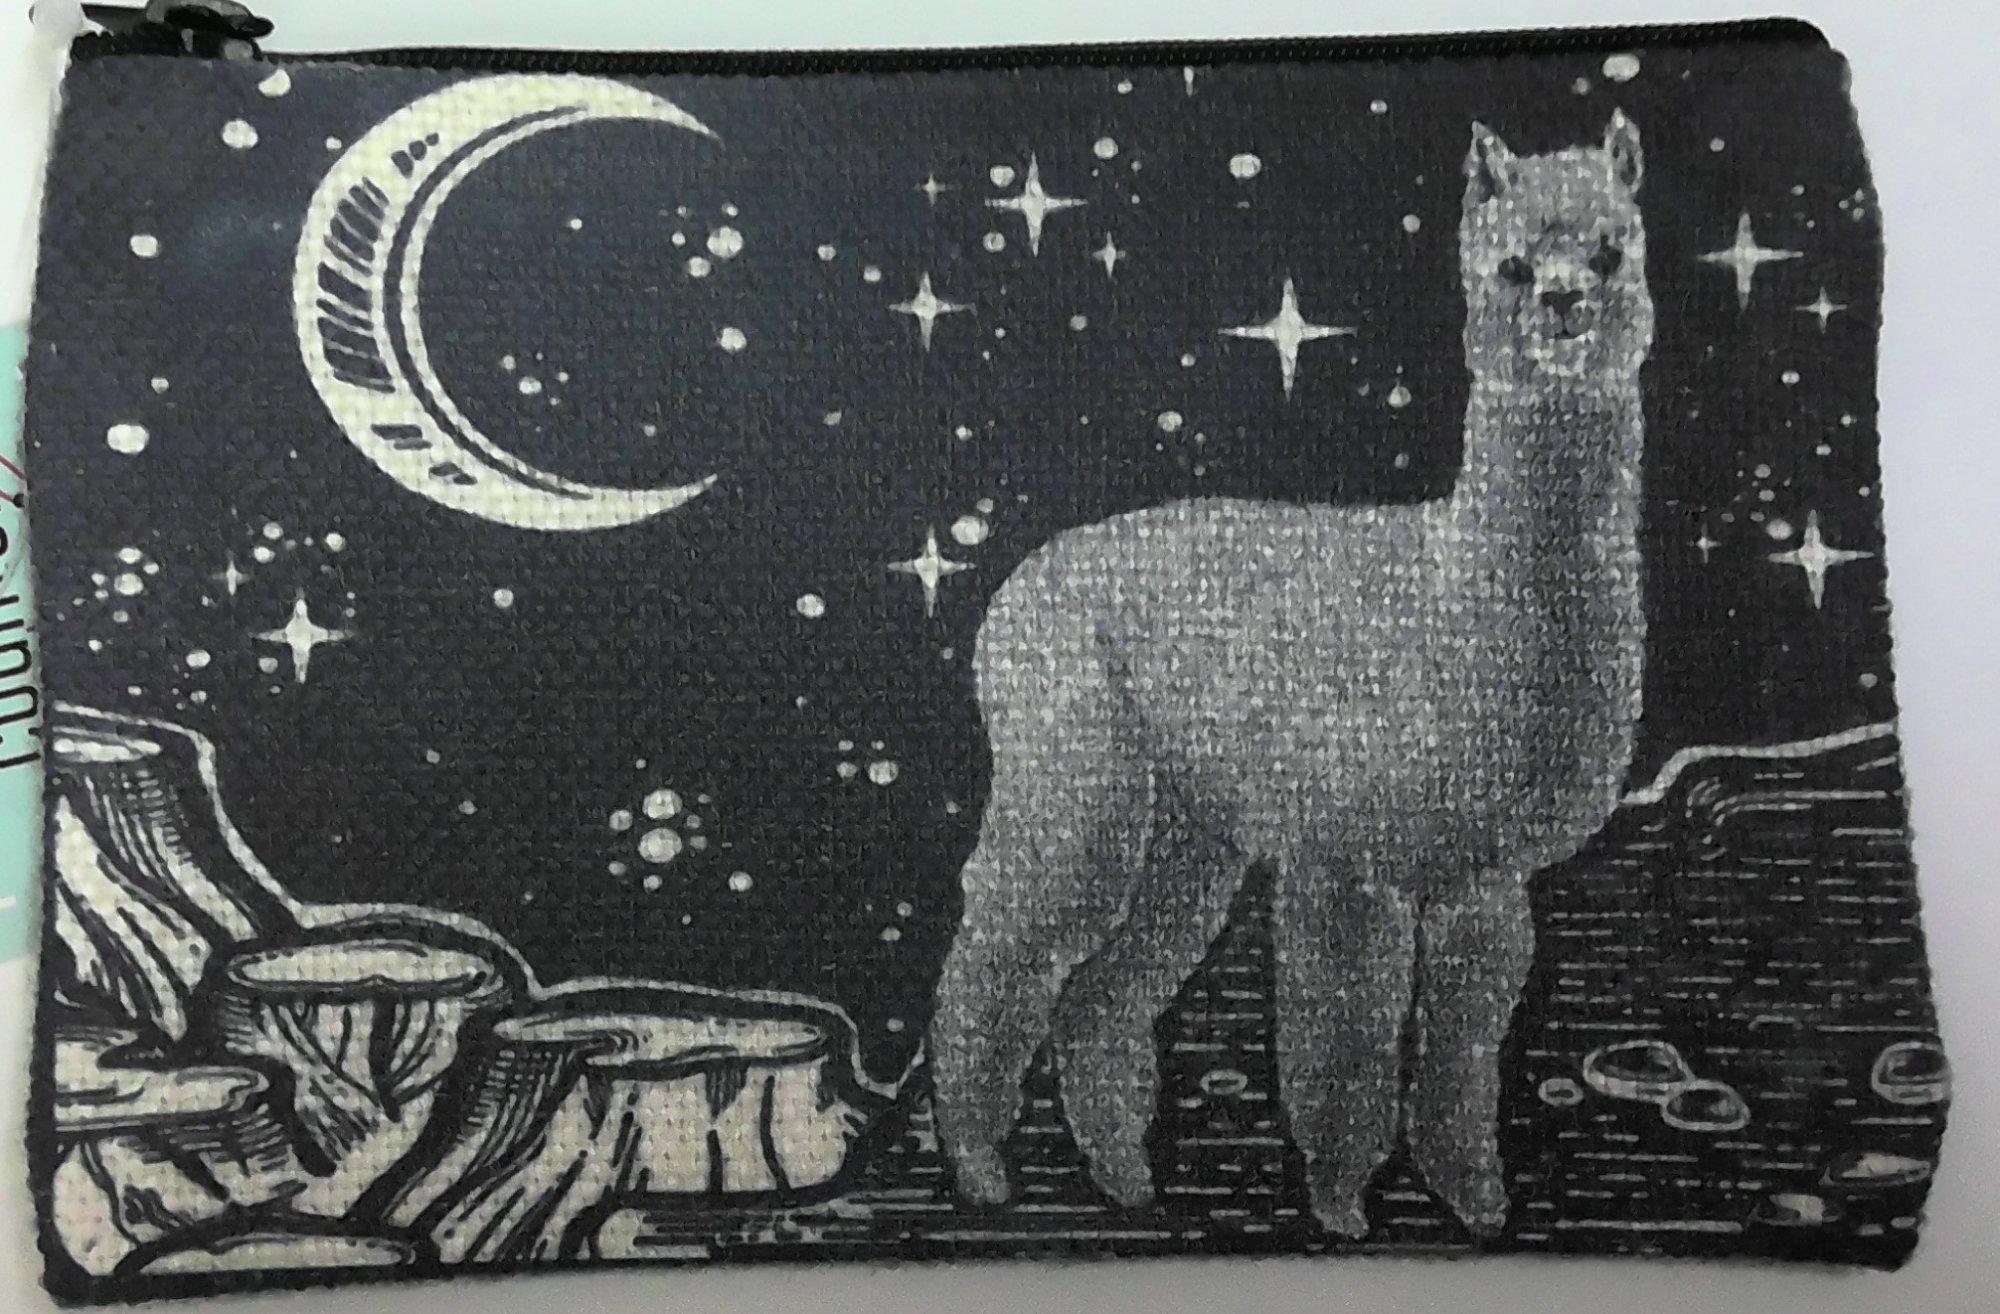 Alpaca Zipper Pouch - Small